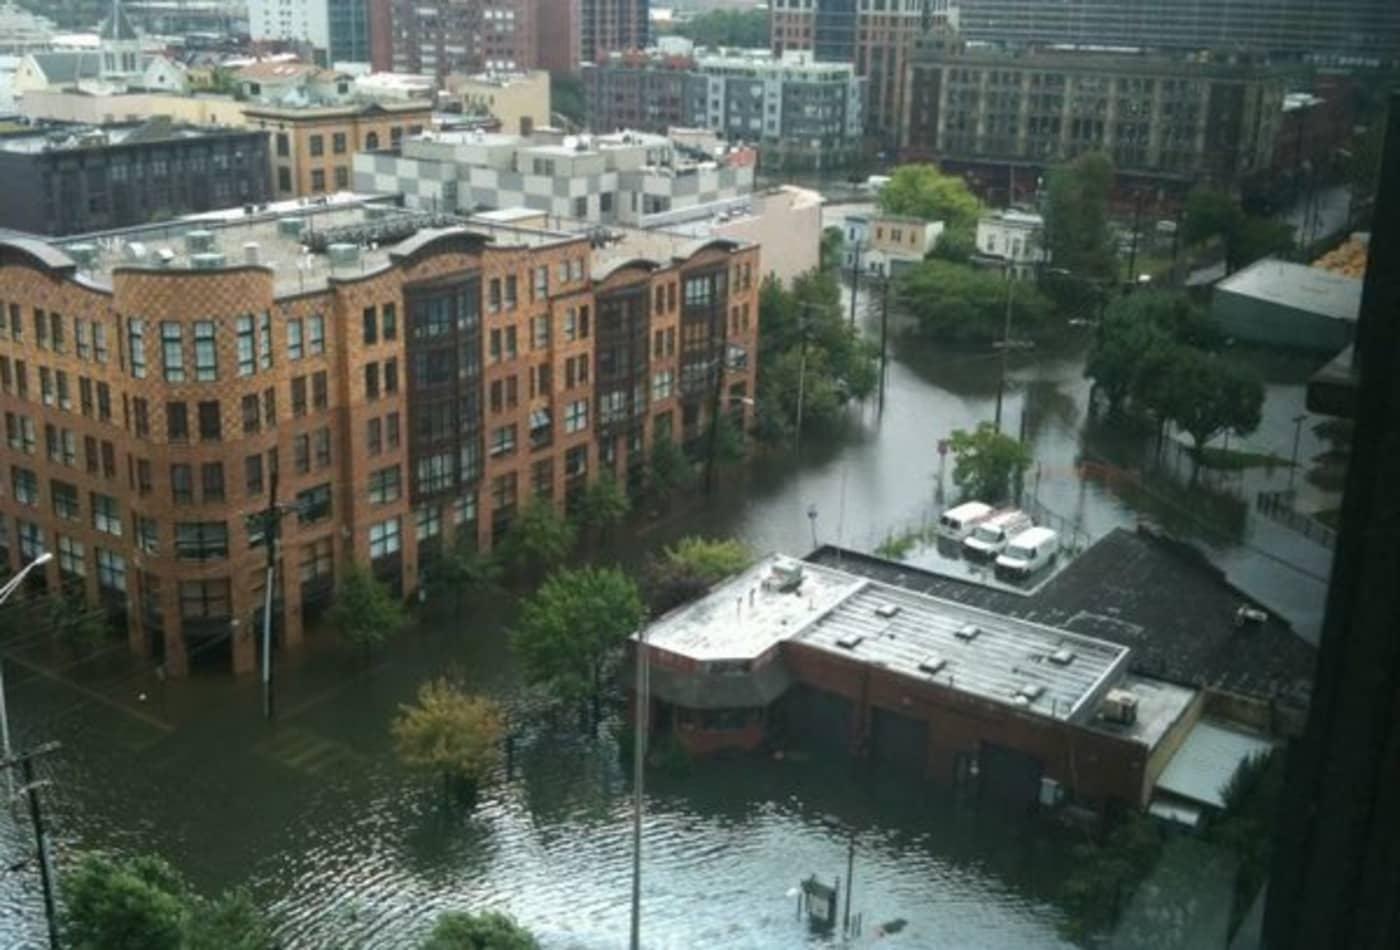 Irene_AUG28_NJ4_hoboken_flood.jpg